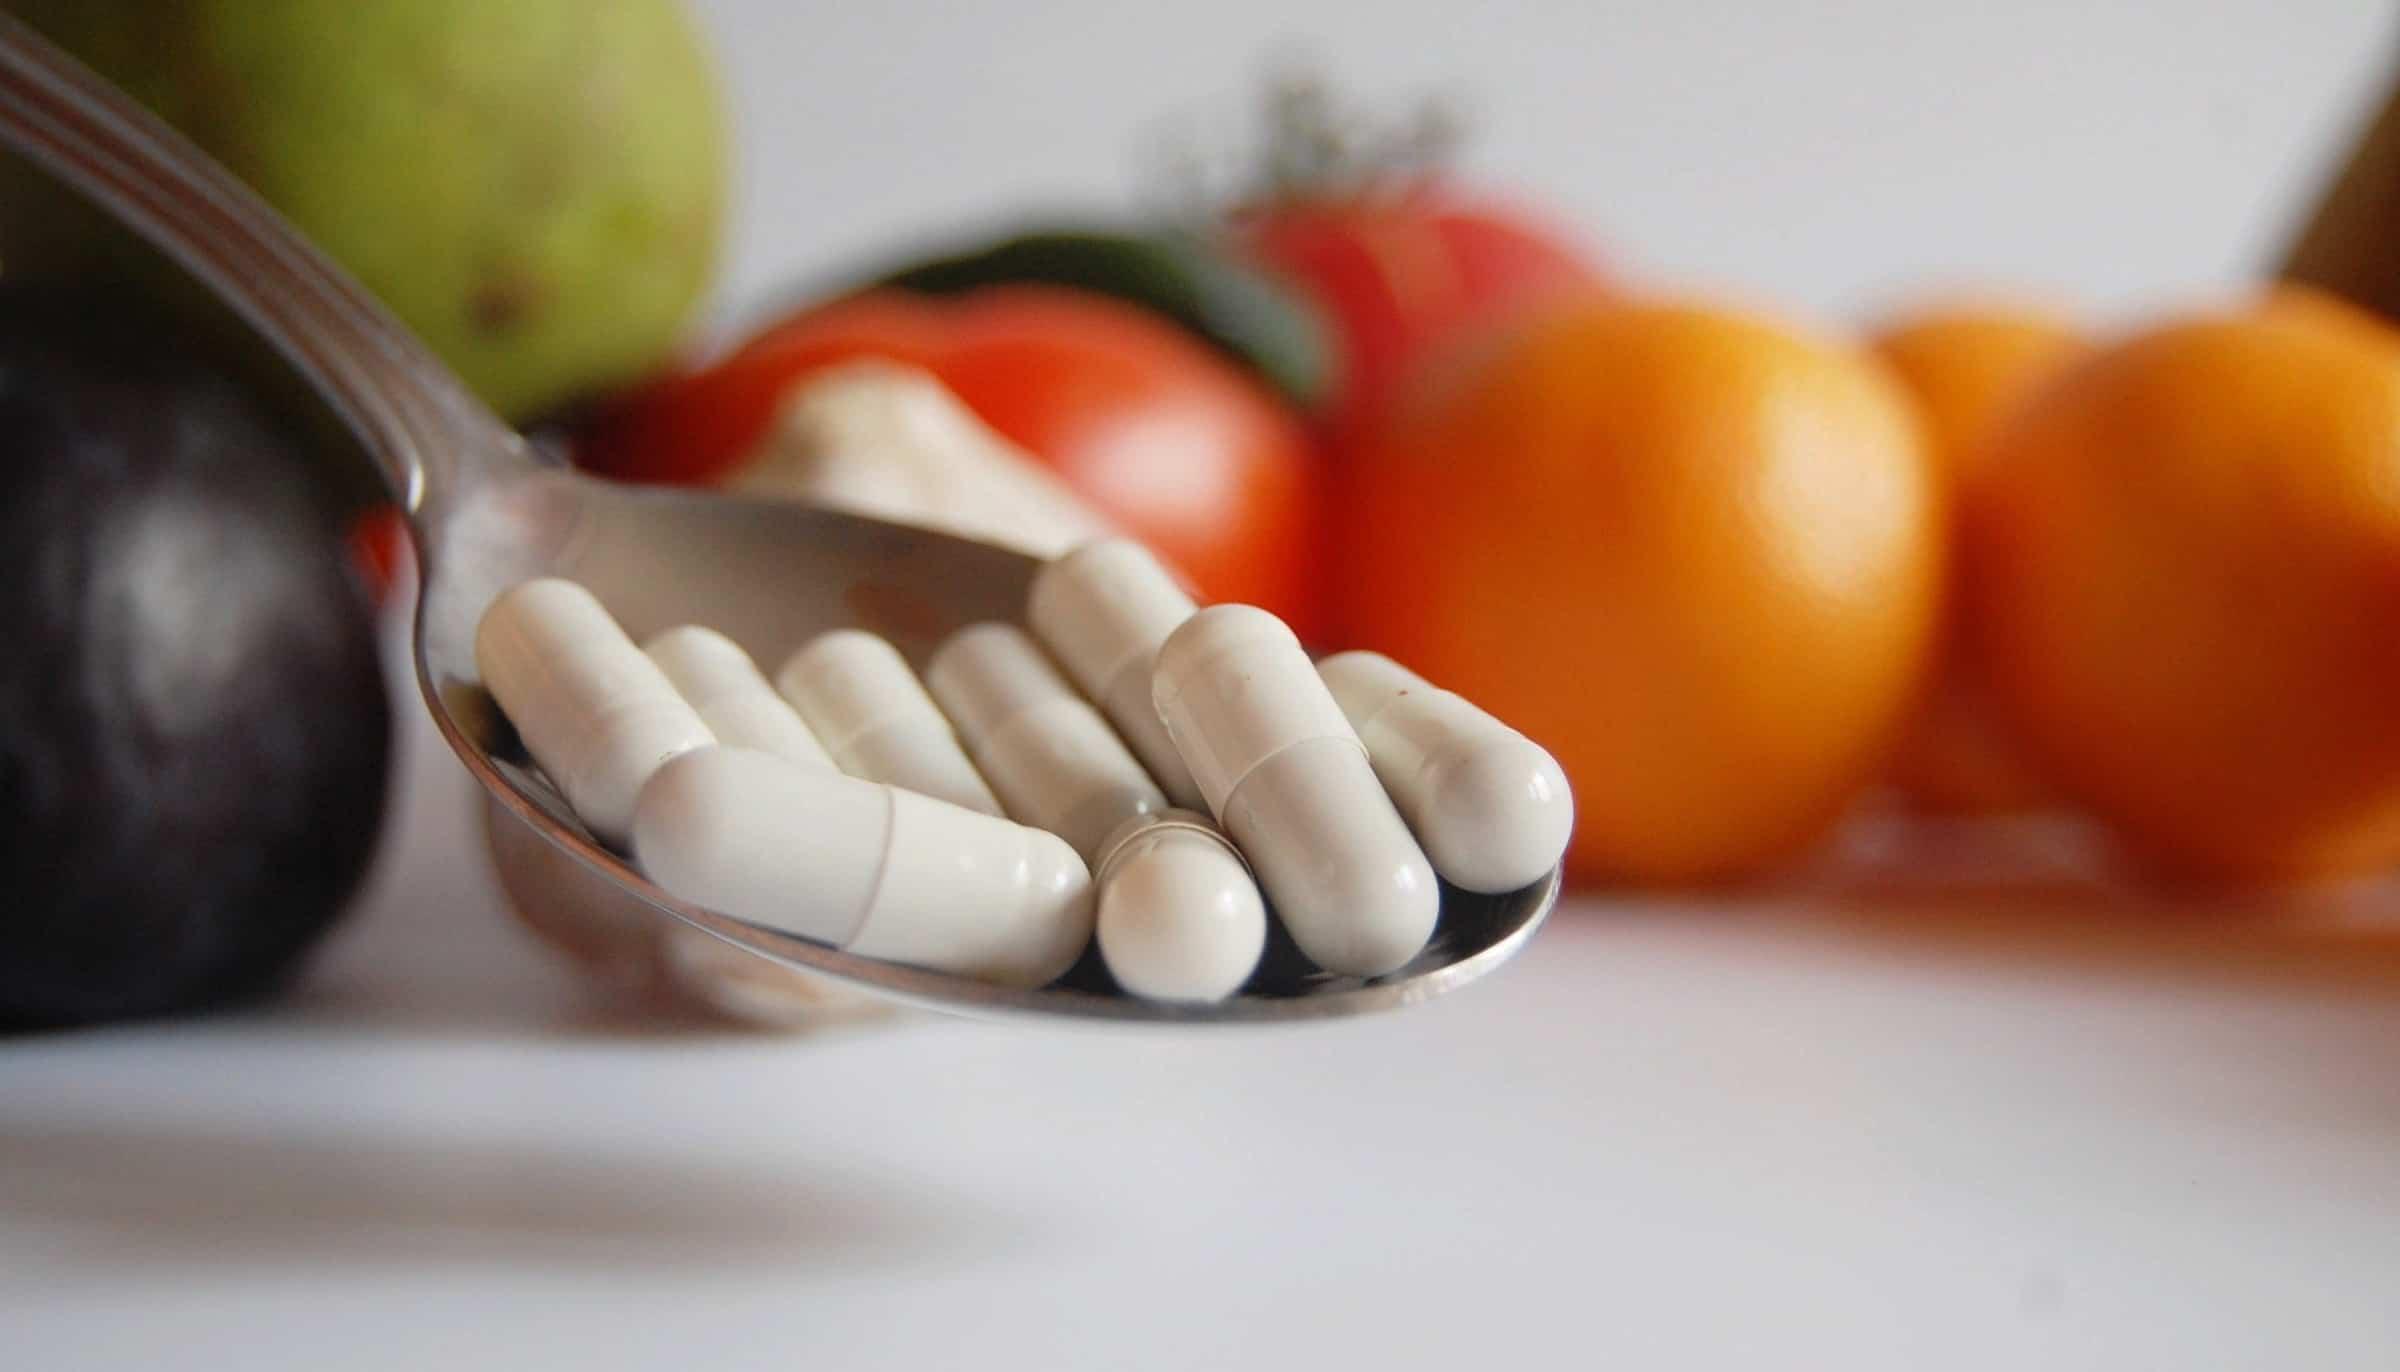 ТОП-10 спортивных витаминов